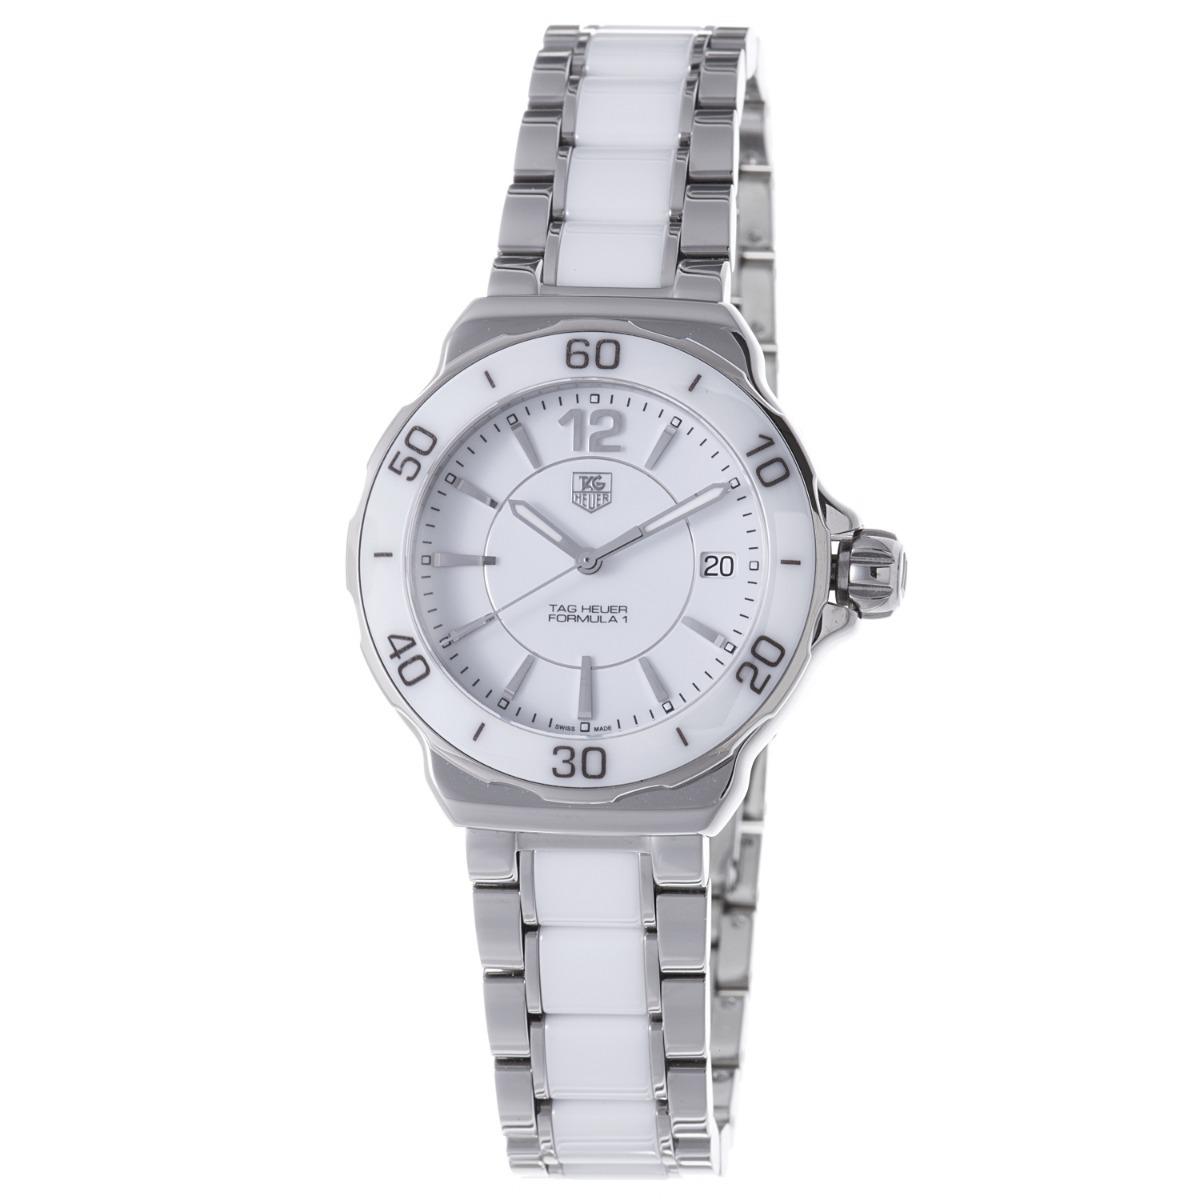 514068cc84b Relógio Tag Heuer Formula 1 - Stainless Steel White Ceramic - R ...